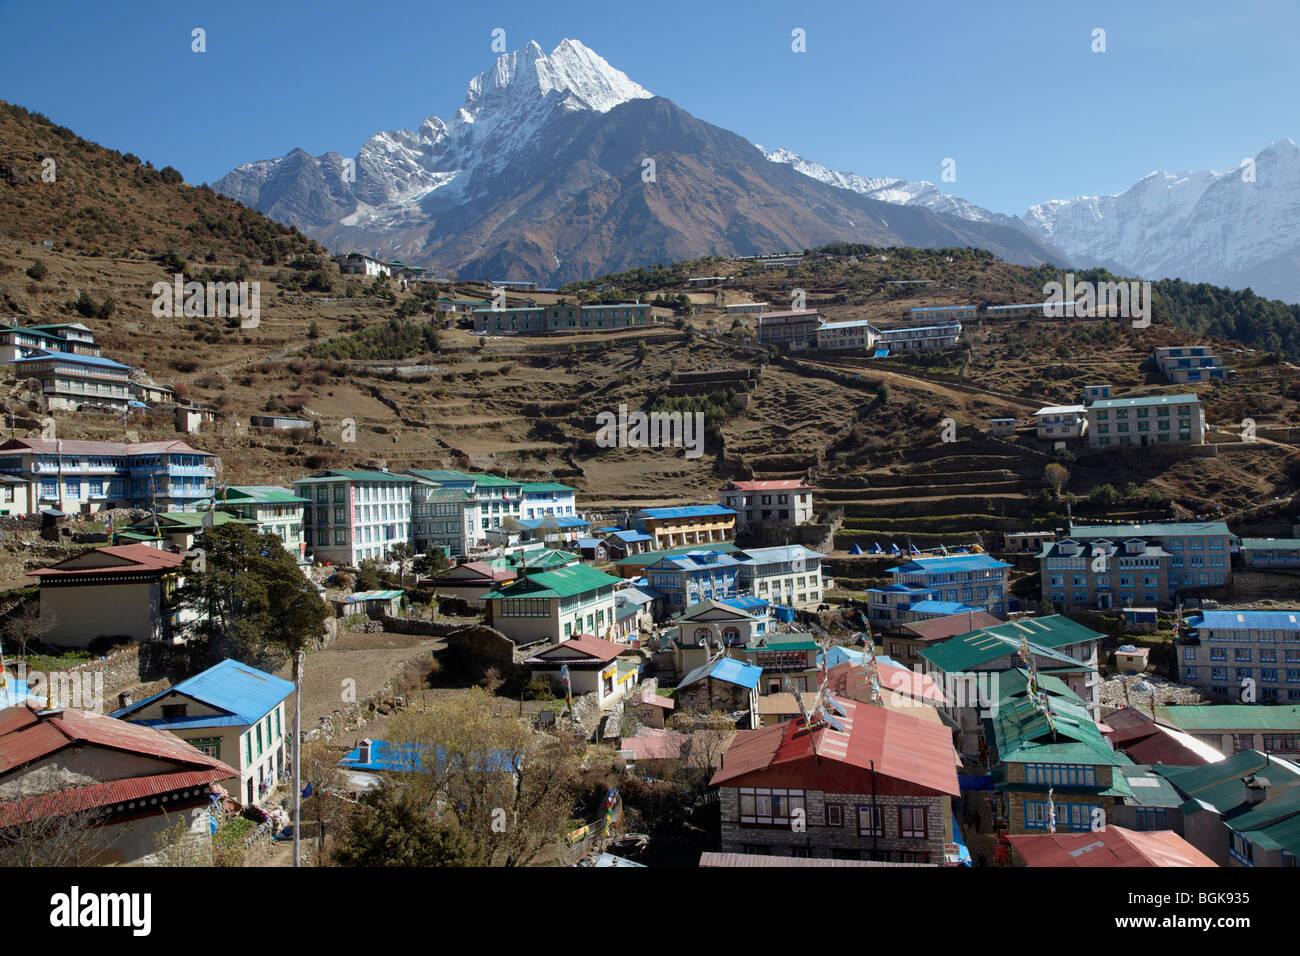 Namche Bazaar Everest Region Himalayas Nepal Asia - Stock Image